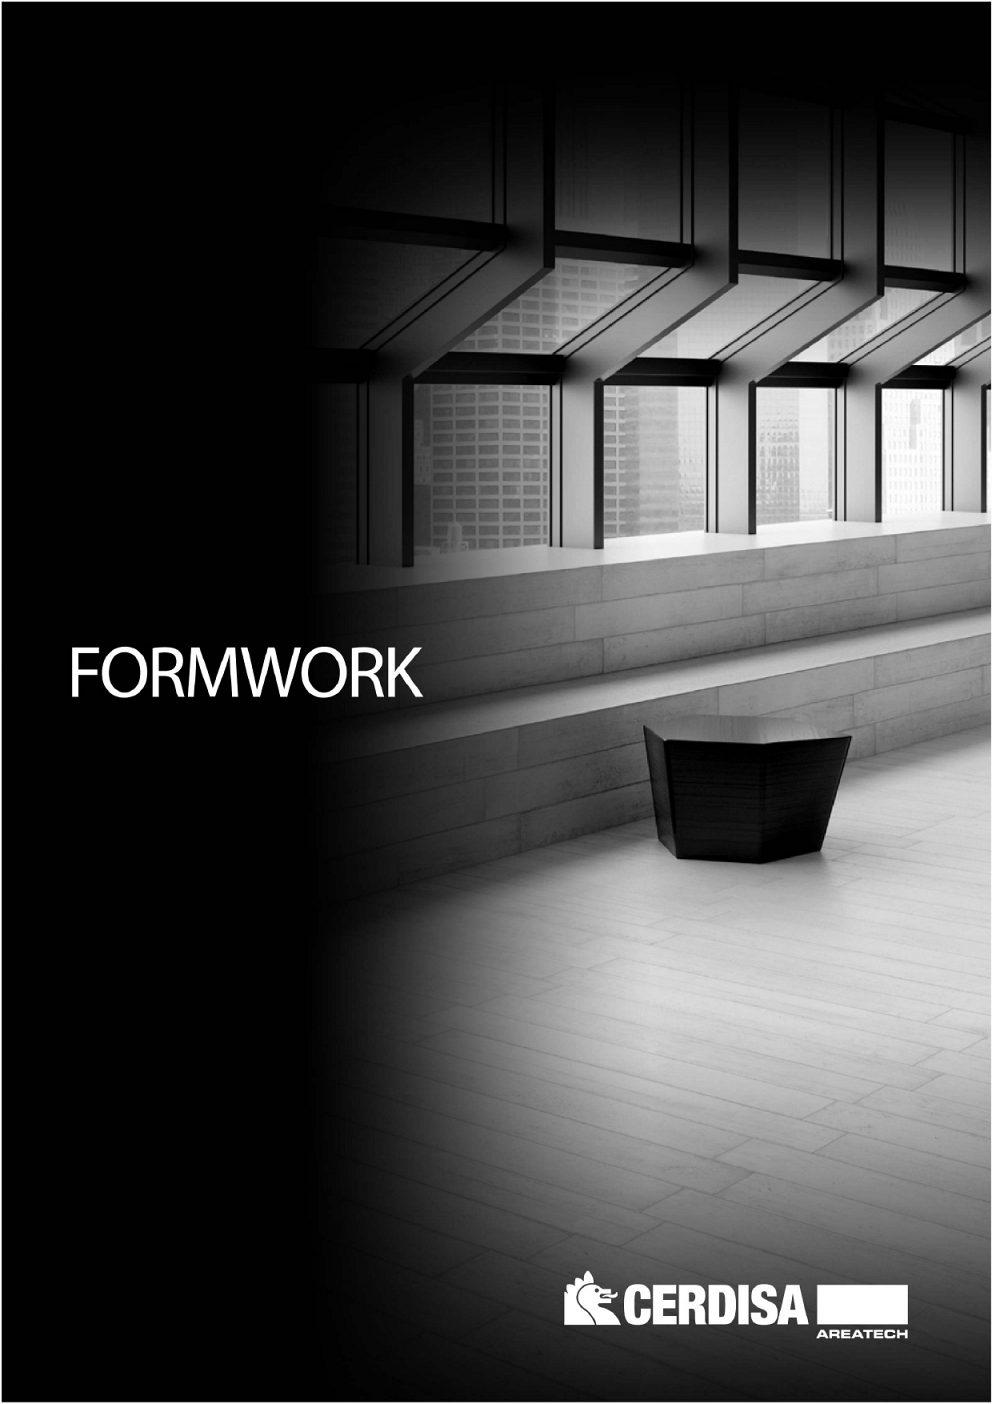 Cerdisa - Formwork